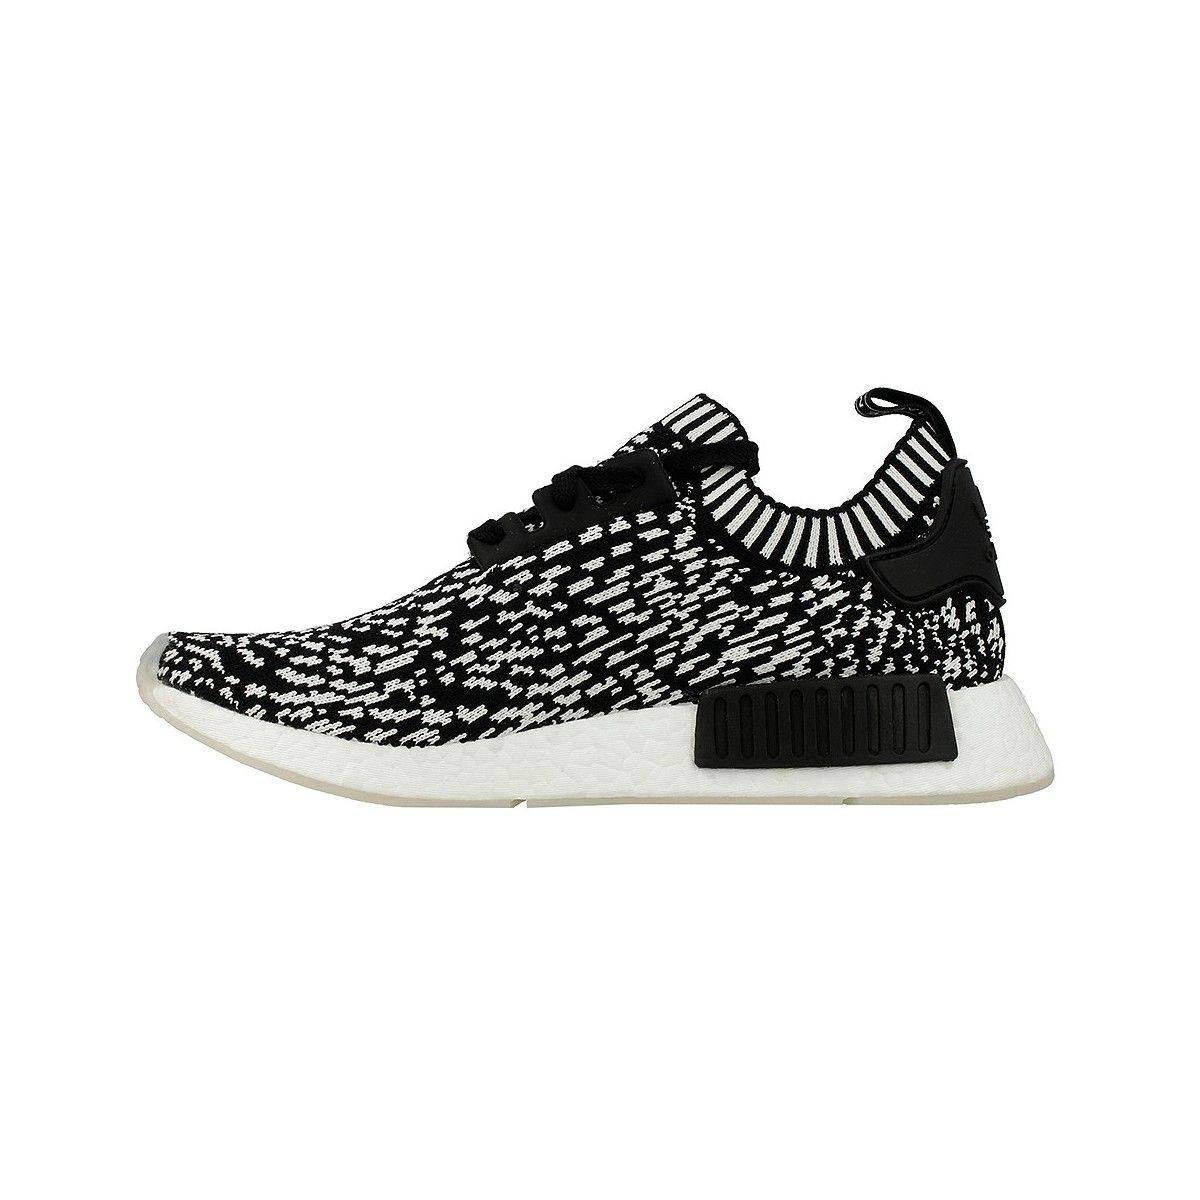 sélection premium 0adcb a591c Baskets Adidas Nmd R1 Pk Noir Blanc Femme - Taille : 41 1/3 ...